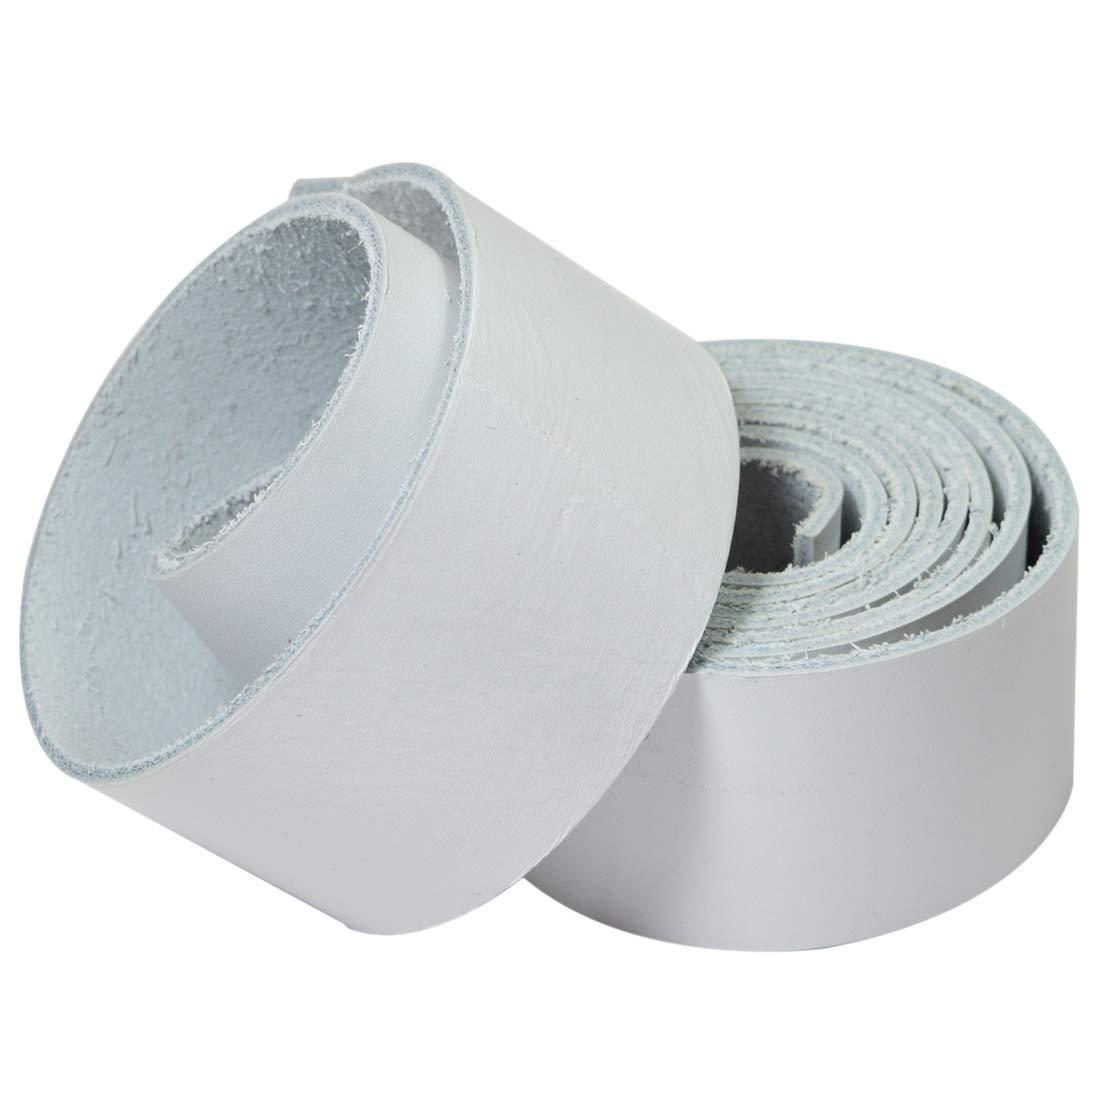 Hide & Drink レザー ストロングストラップ 幅1.25インチ コード編組ストリング 中重量 (厚さ1.6mm) 長さ75インチ クラフト/ツール/ワークショップ用 ::::ホワイト B07KYZFSV1